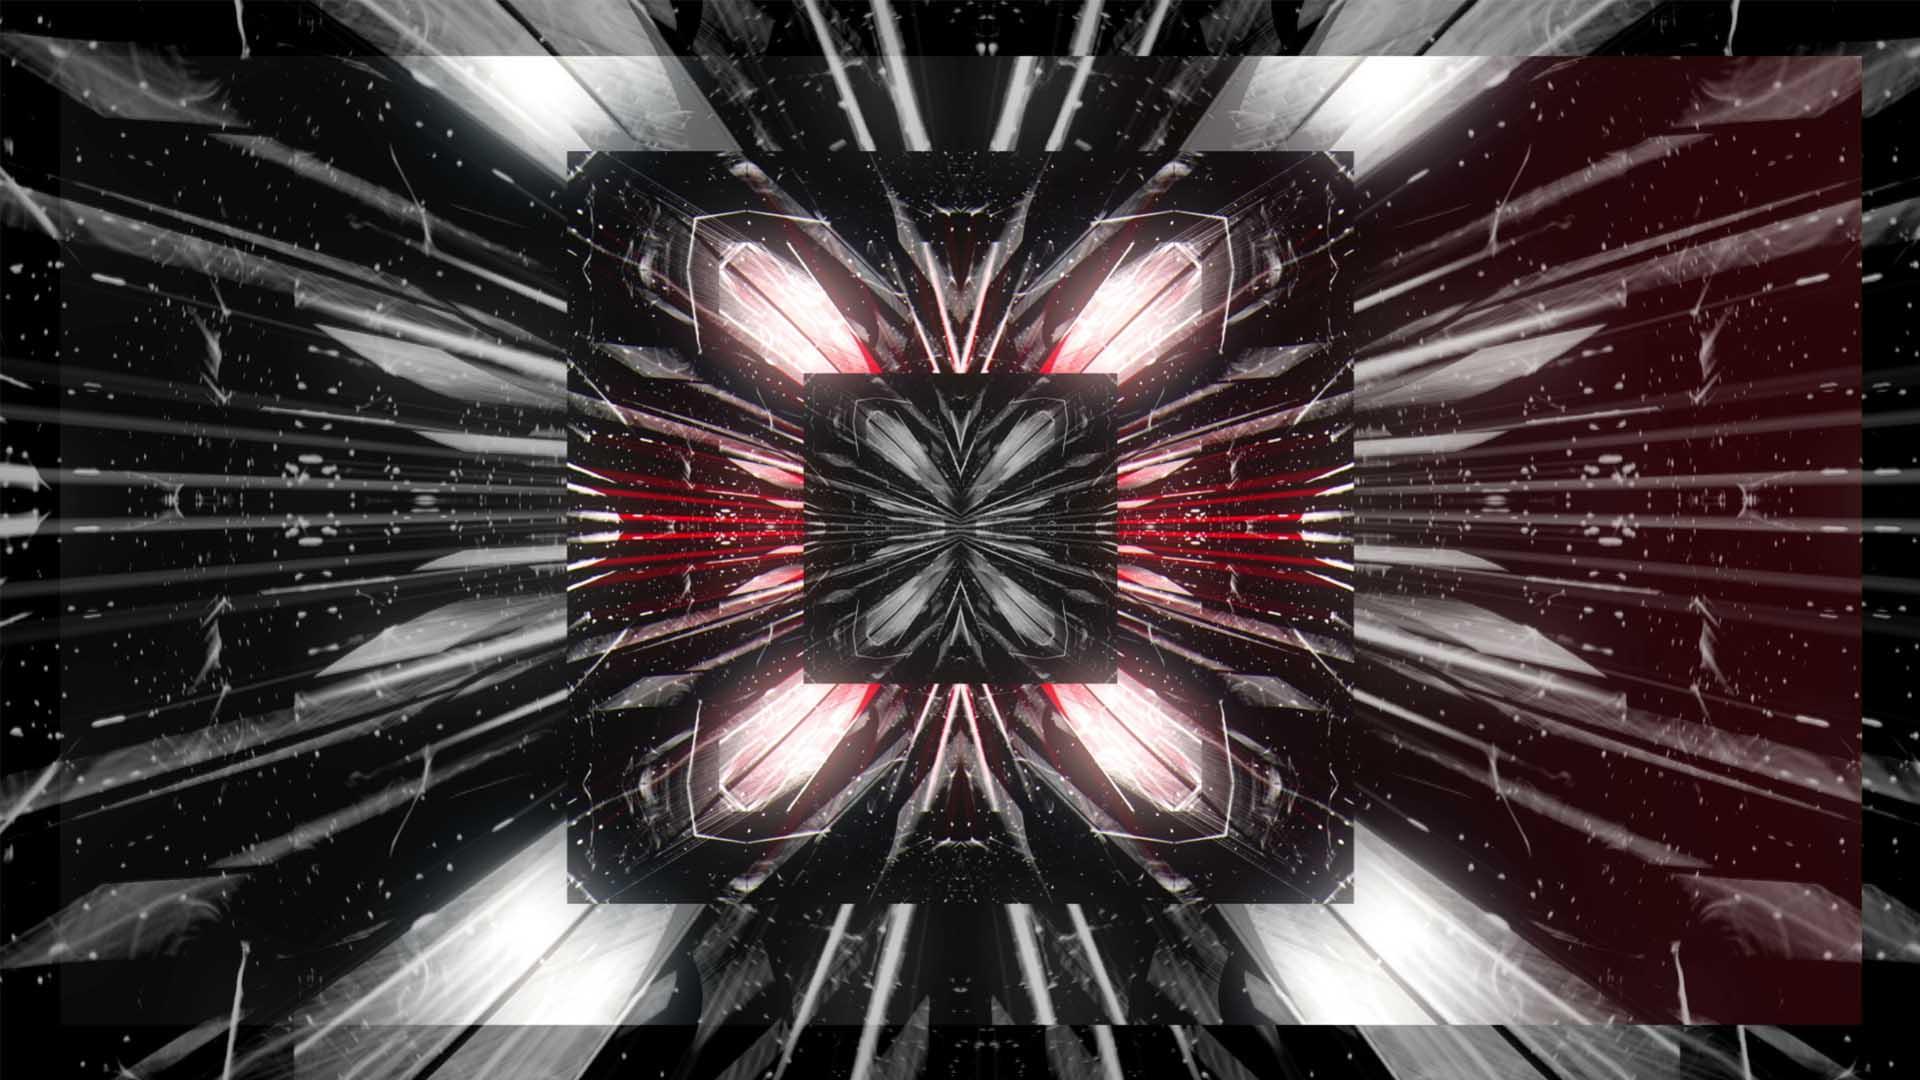 Lovely_Red_Video_background_Slow_VJ_Loop_HD